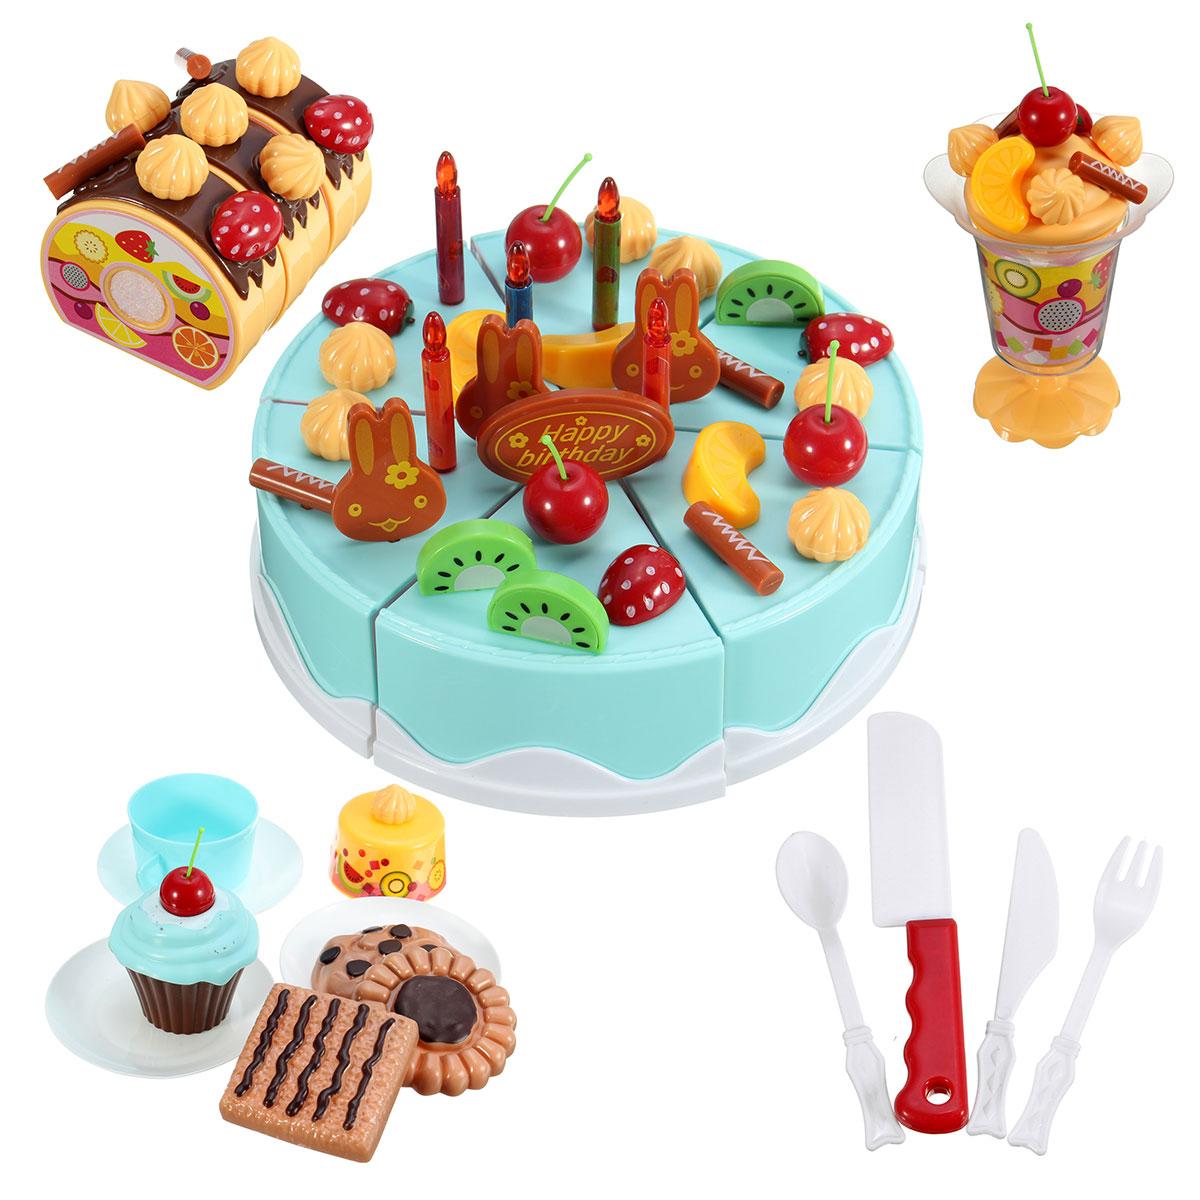 75pcs Set Kids Diy Plastic Birthday Cake Cookware Kitchen